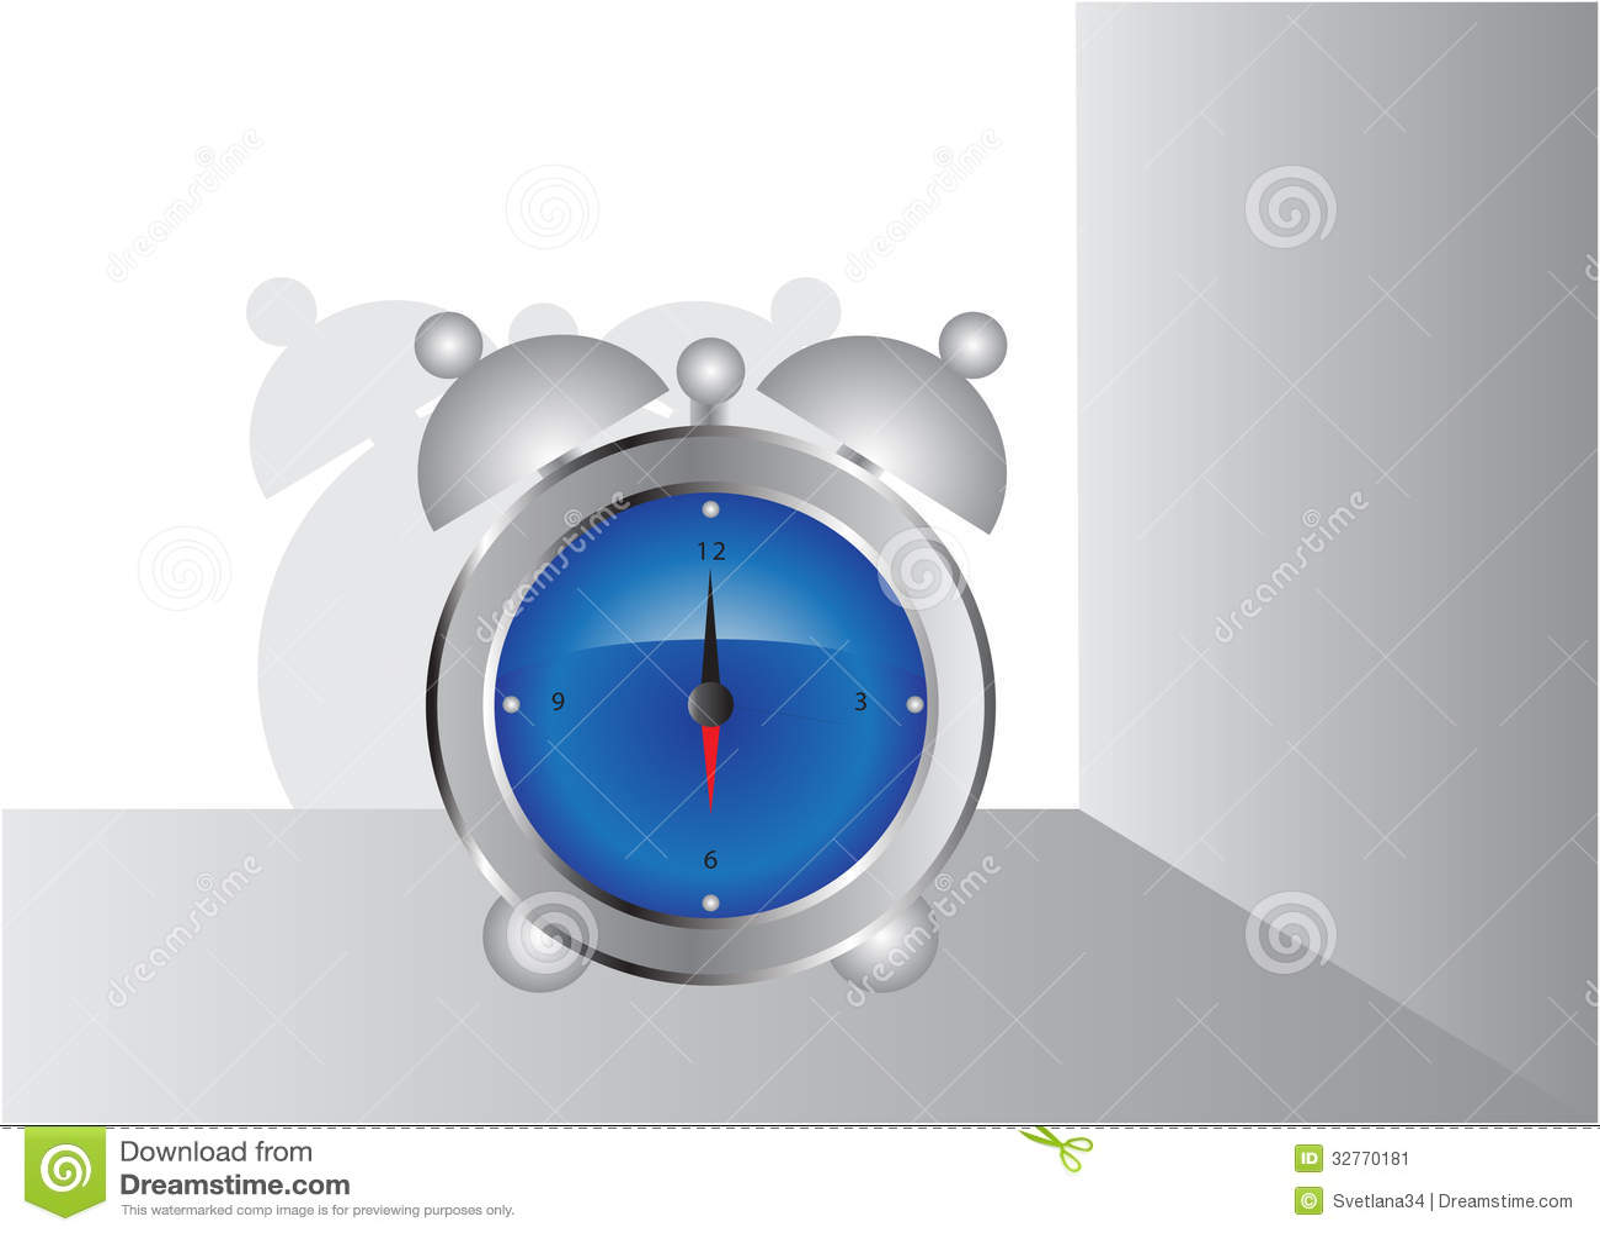 Household items, alarm clock.